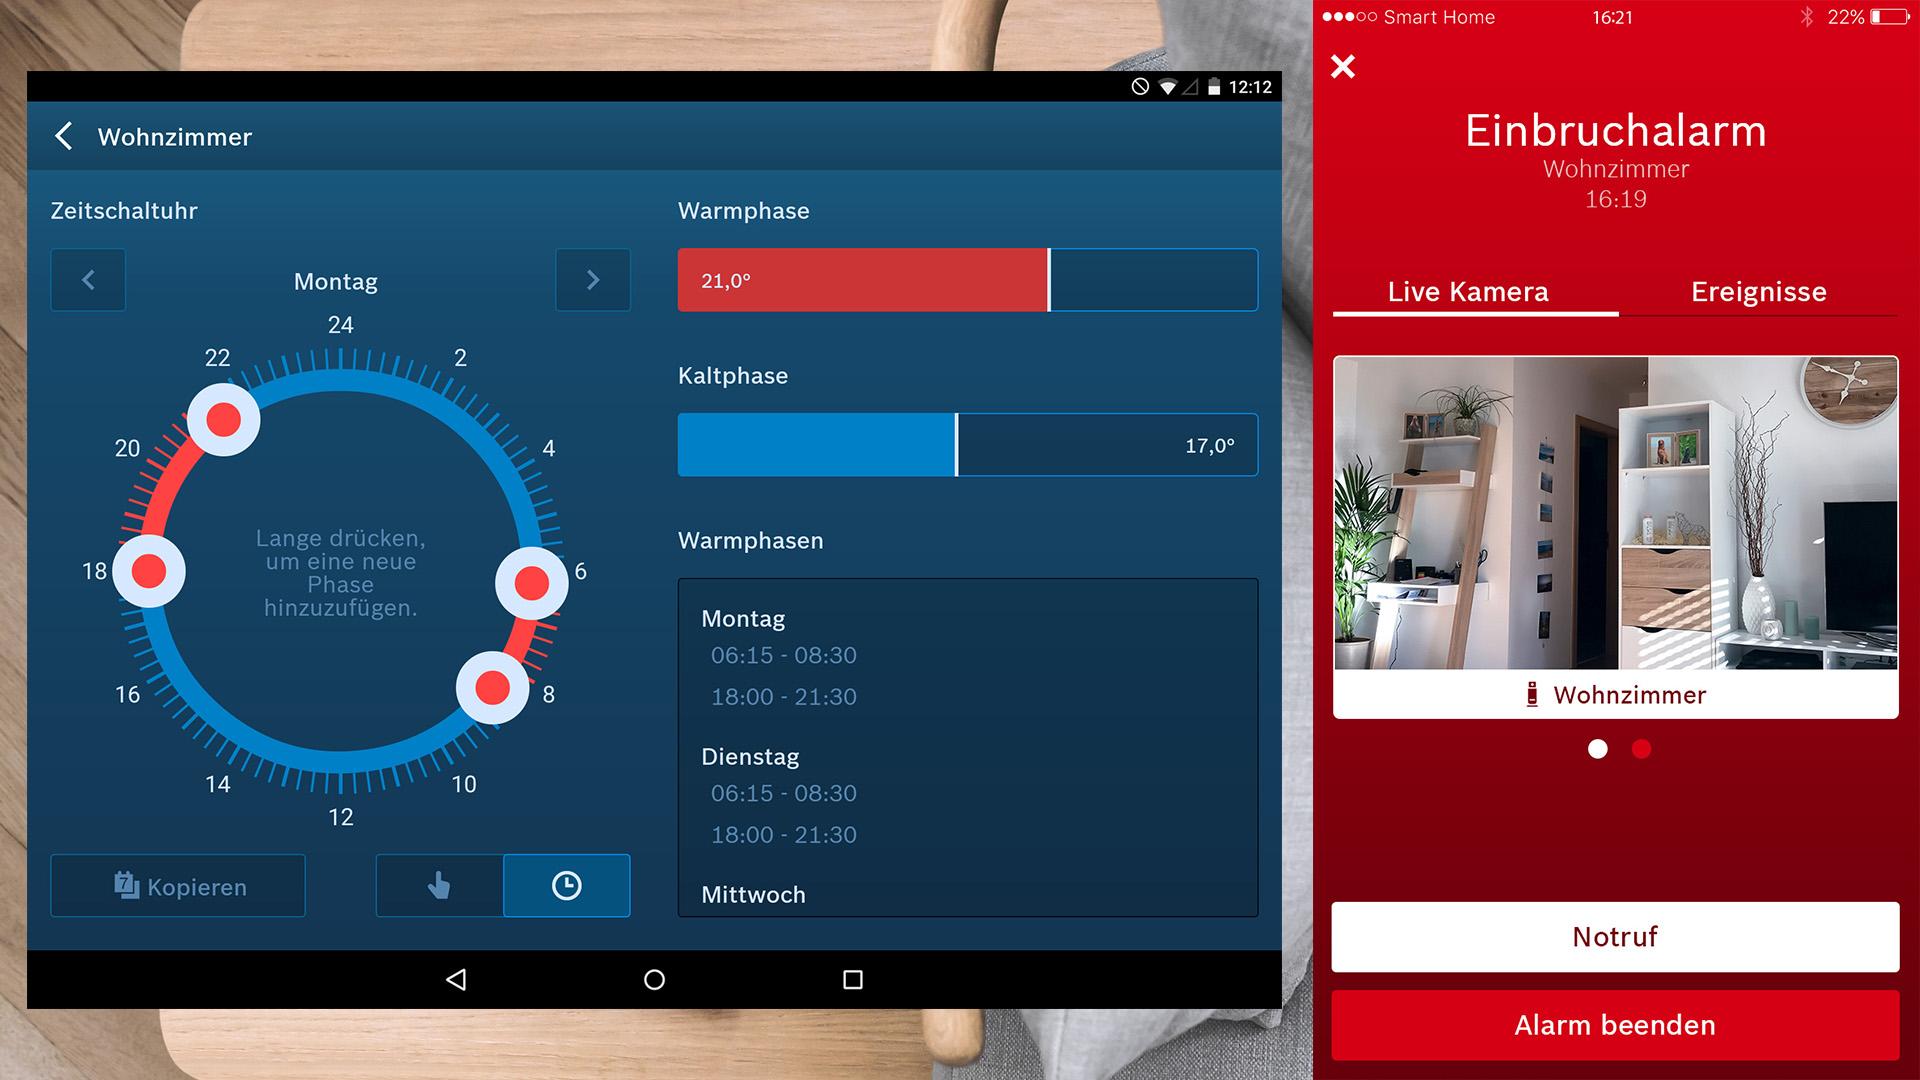 Bosch Smart Home - Smart Home App - digitalewelt.at